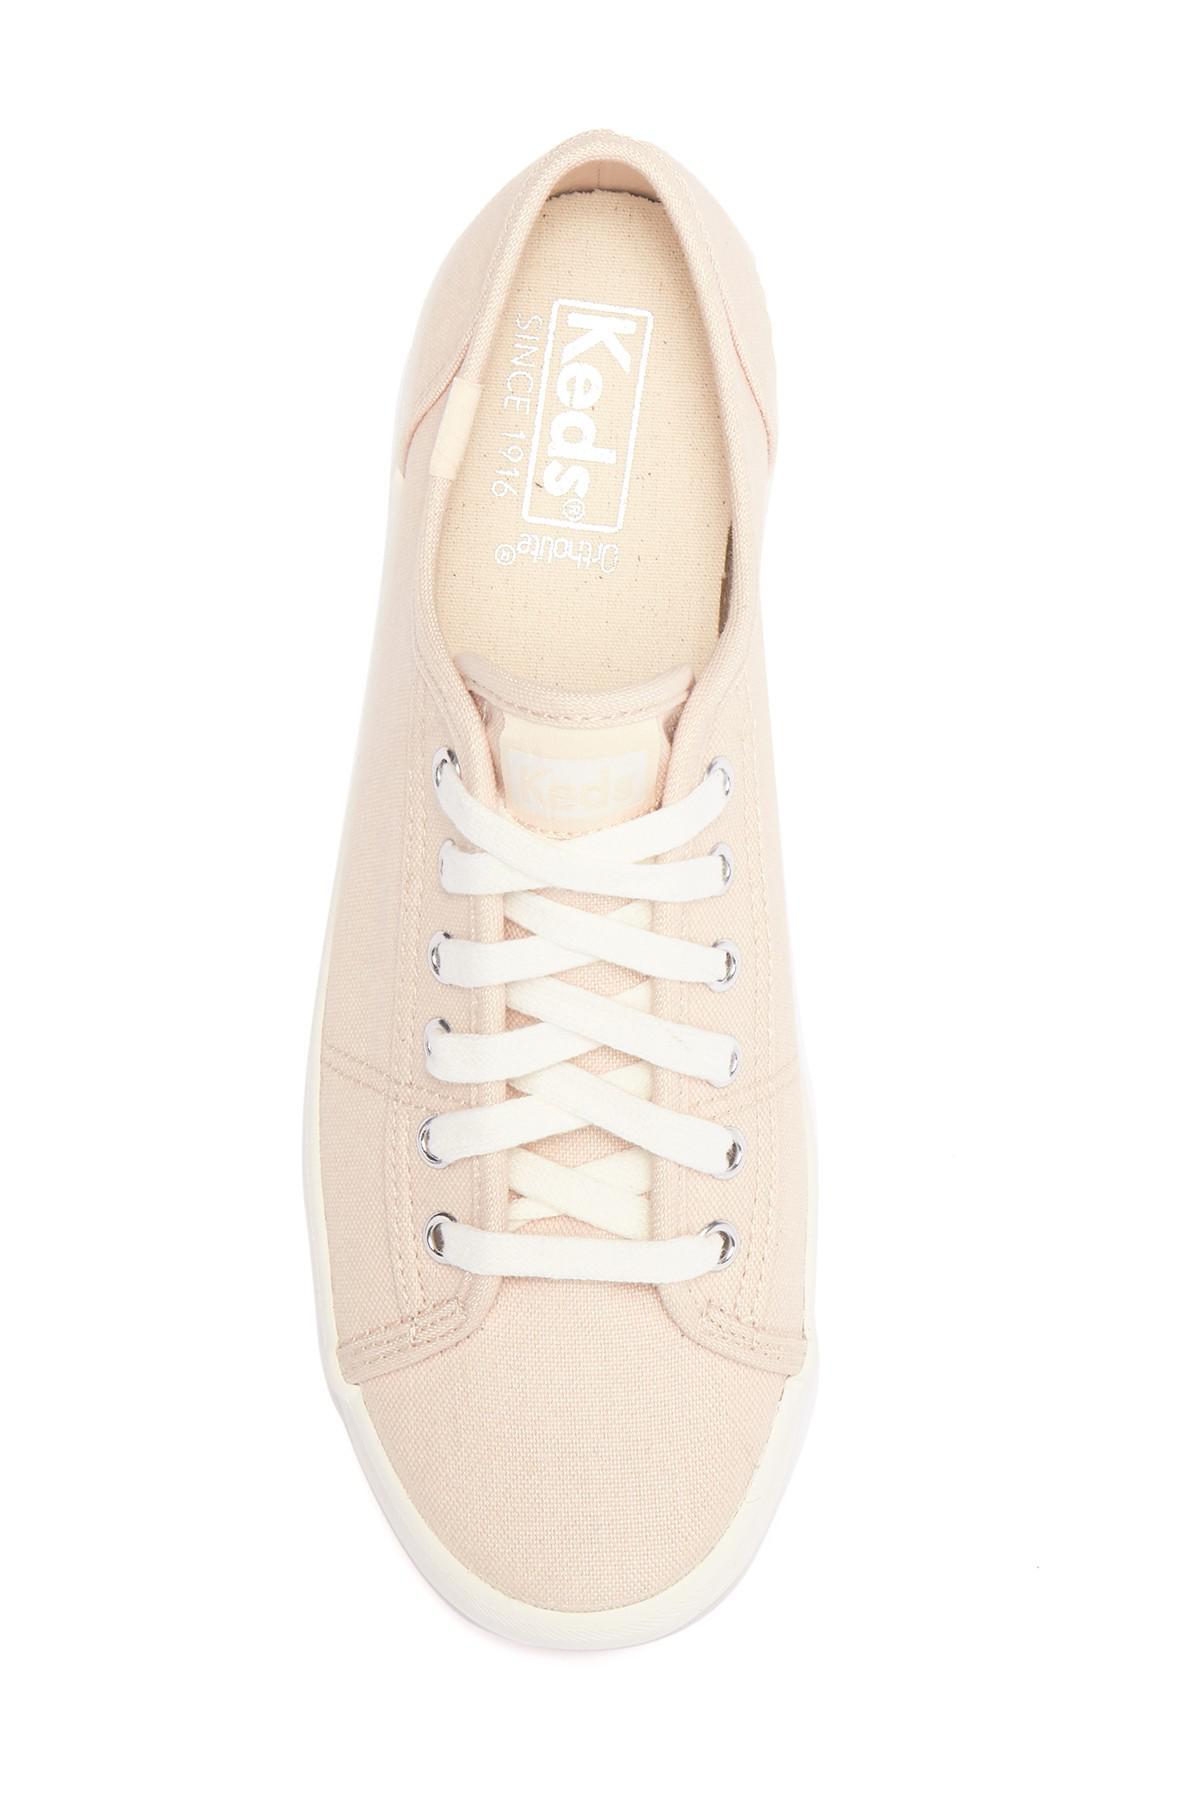 Keds Lace Kickstart Chambray Sneaker in